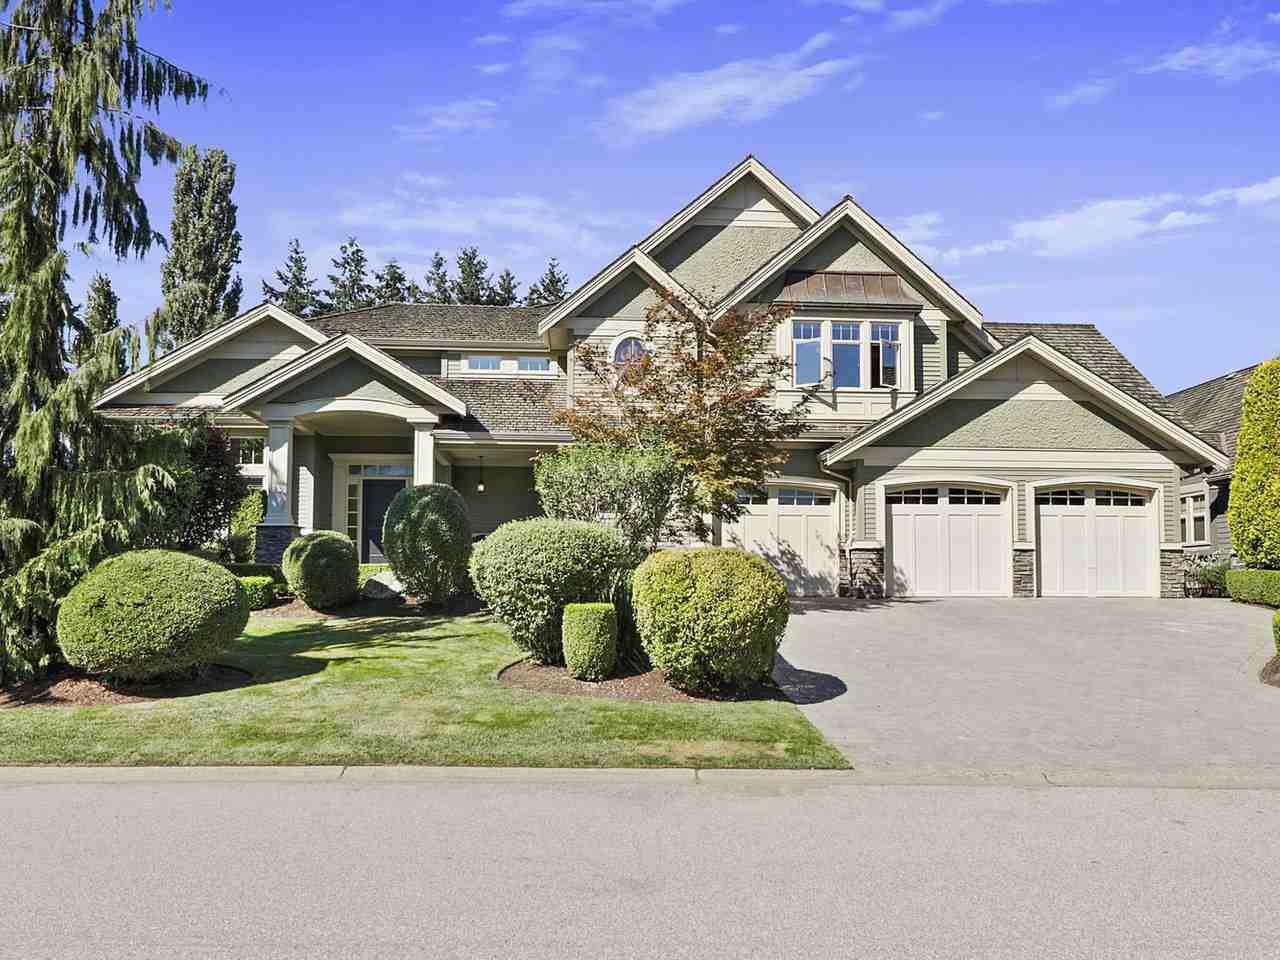 "Main Photo: 15845 39A Avenue in Surrey: Morgan Creek House for sale in ""MORGAN CREEK"" (South Surrey White Rock)  : MLS®# R2493602"